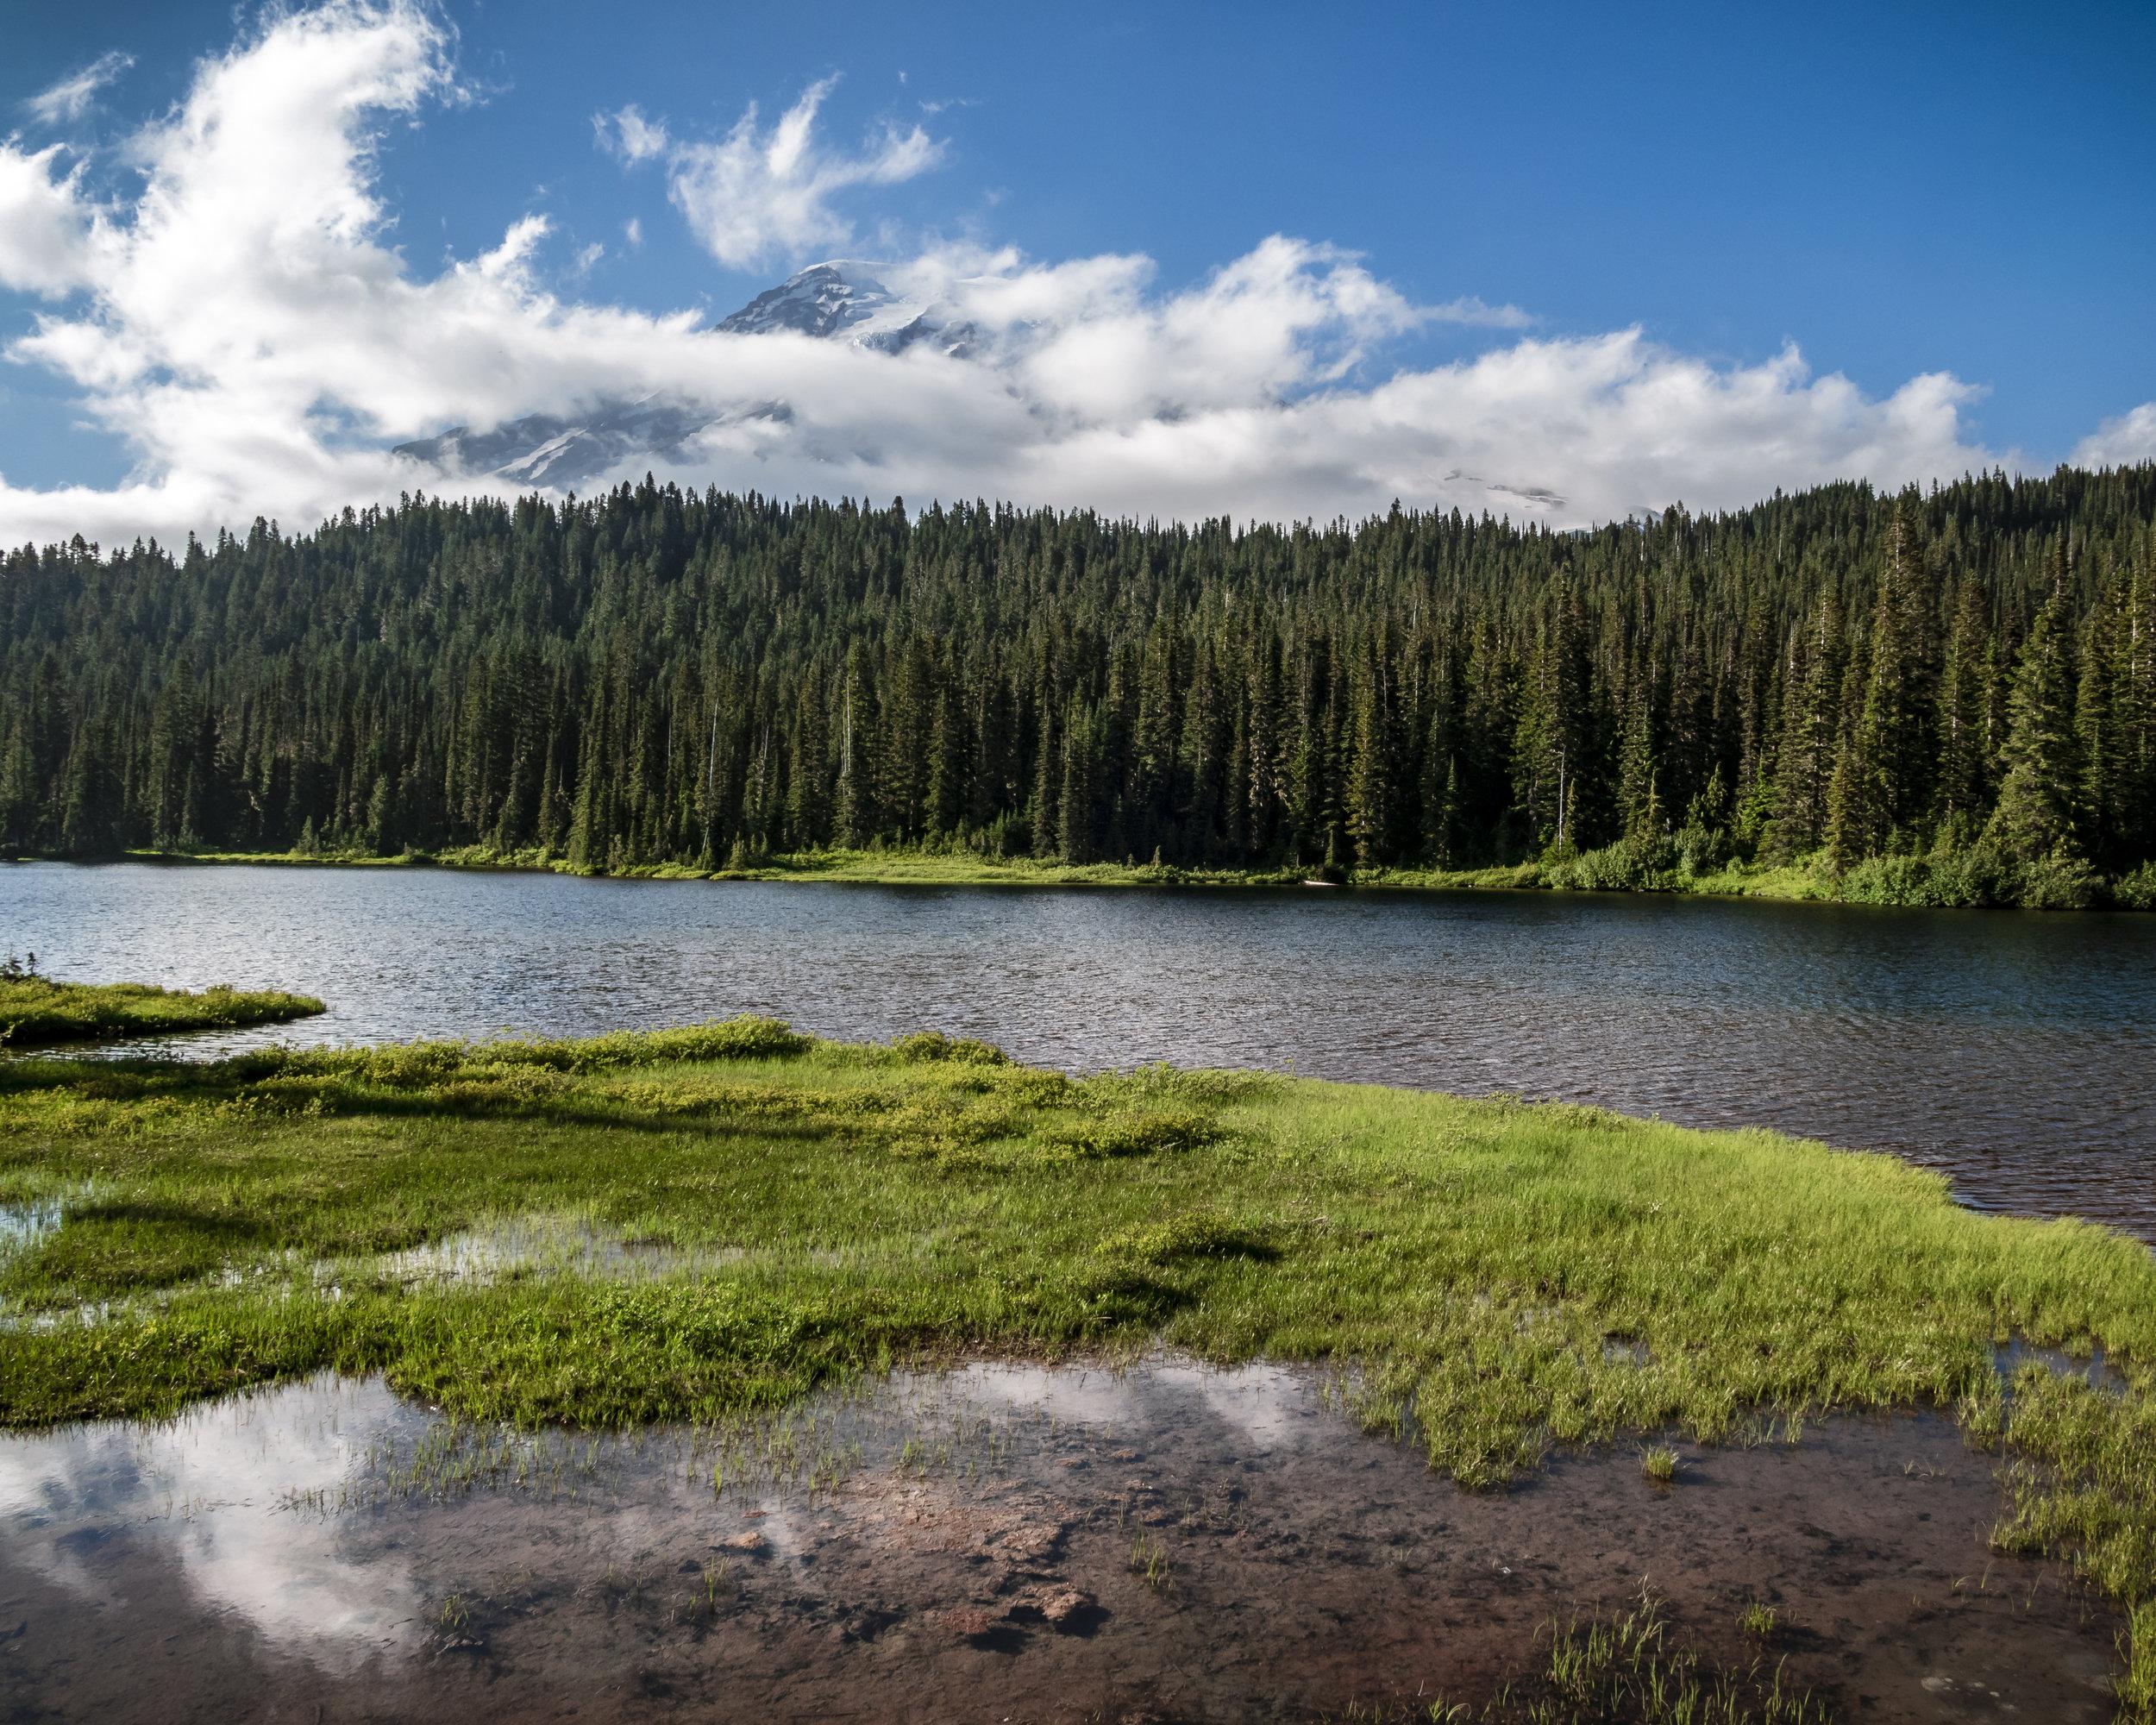 Reflection_Lakes_on_Sunny_Summer_Day_in_Mt_Rainier_National_Park.jpg